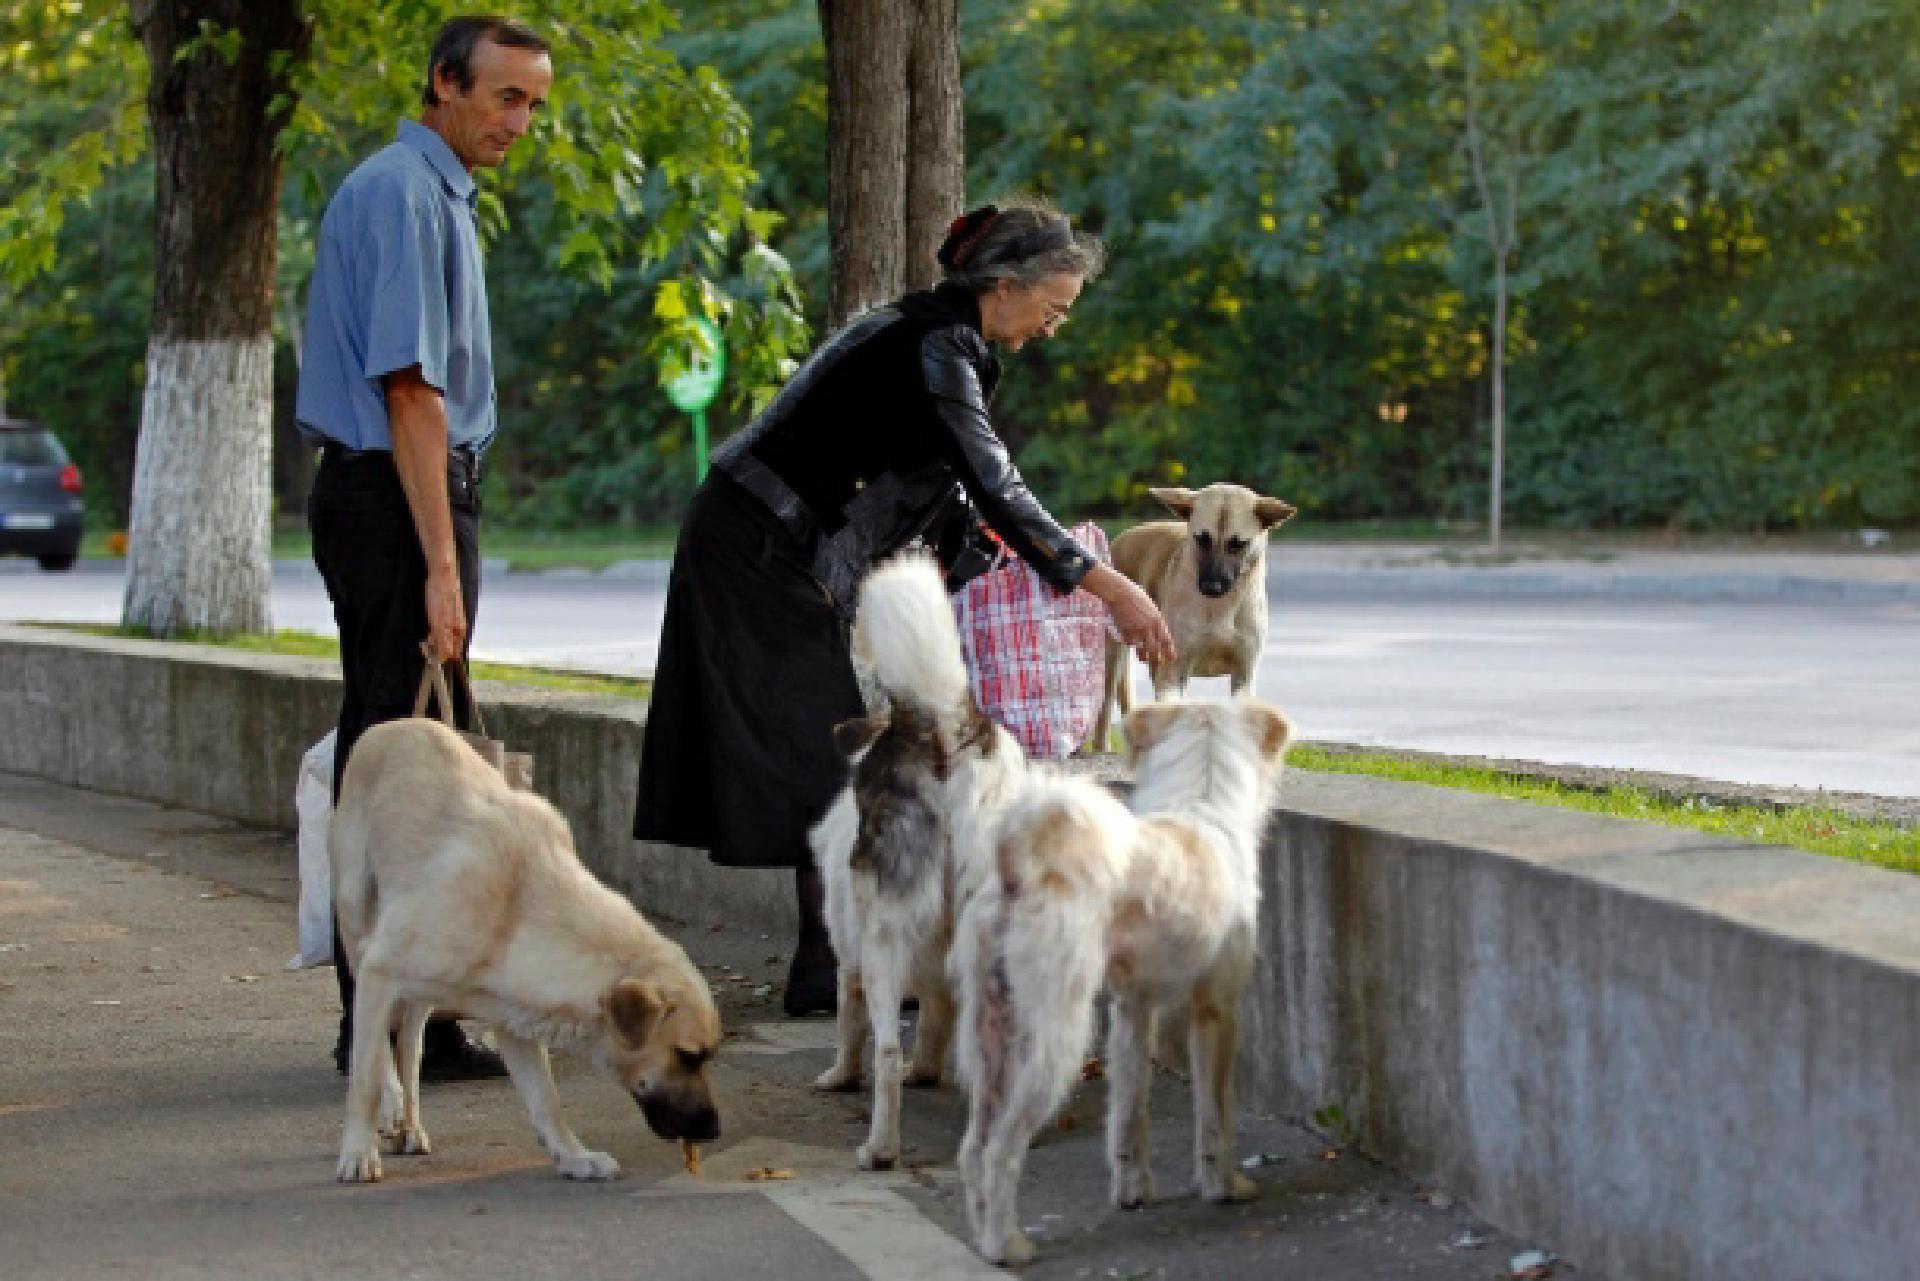 © REUTERS In einem Park in Bukarest: Anwohner füttern streunende Hunde.